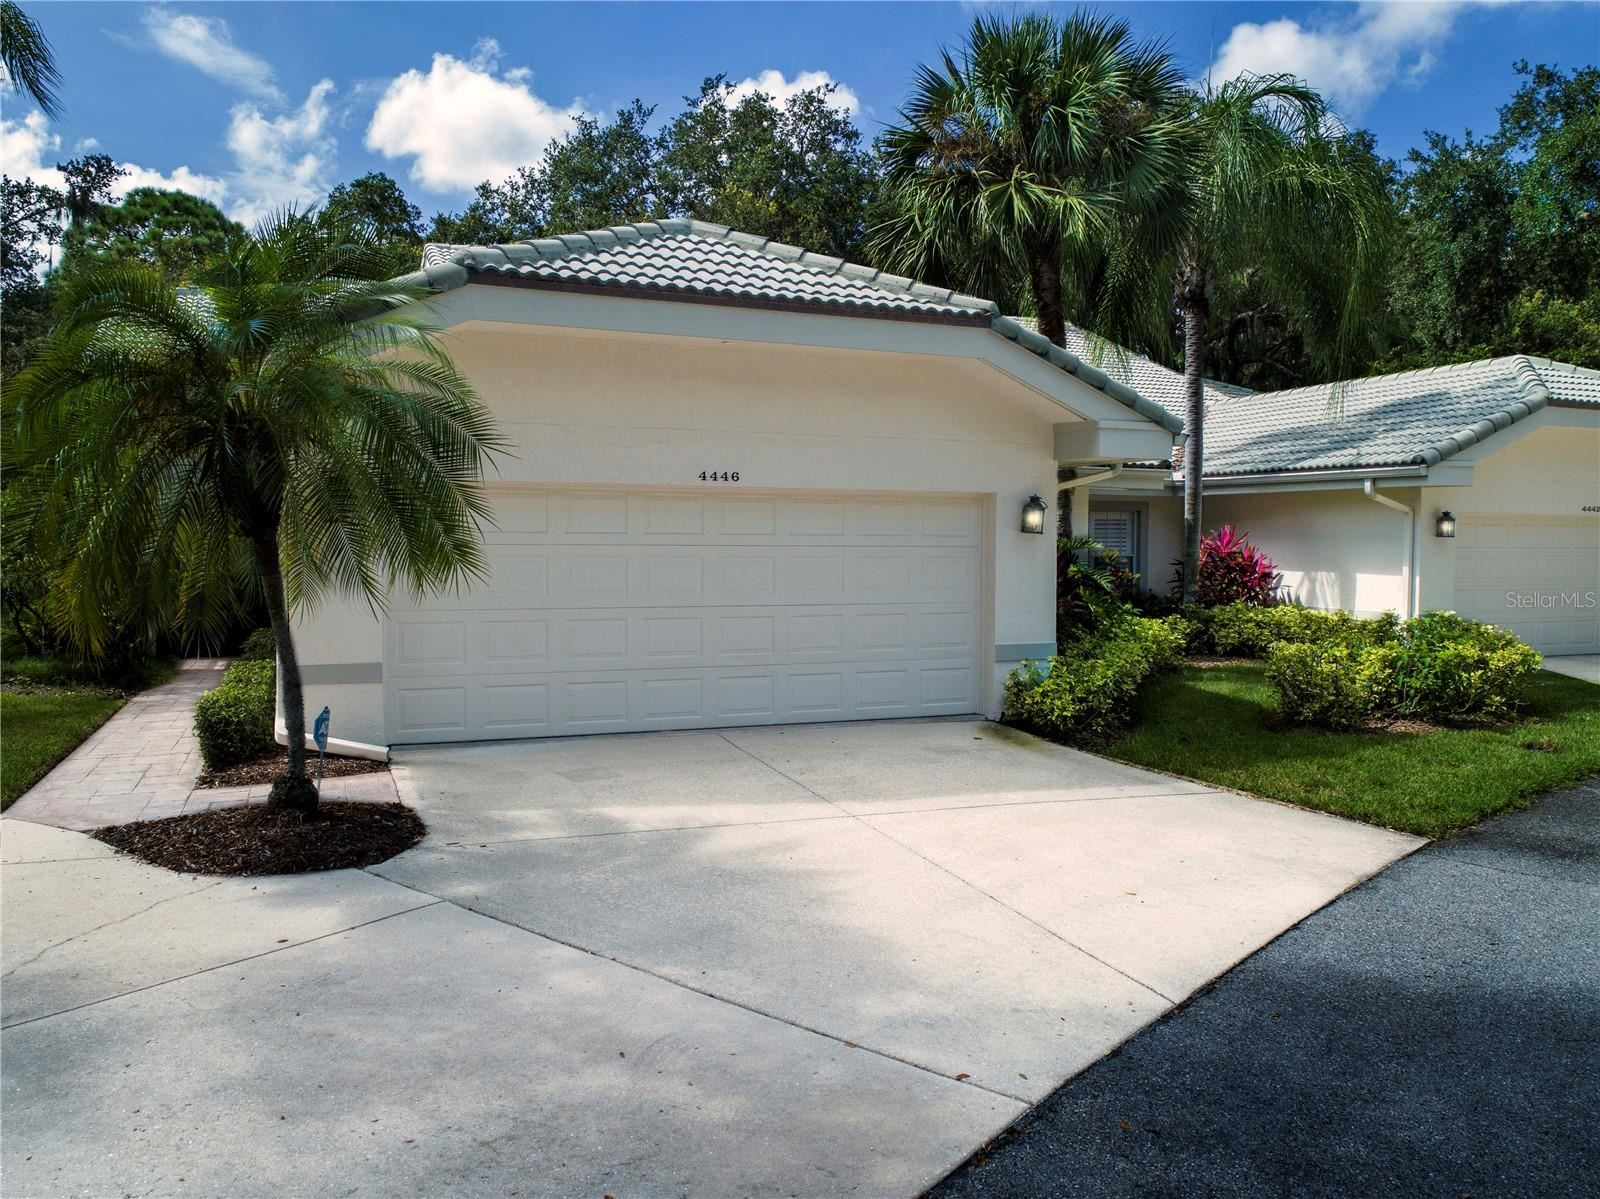 4446 WHISPERWOOD #6, Sarasota, FL 34235 - #: A4510589